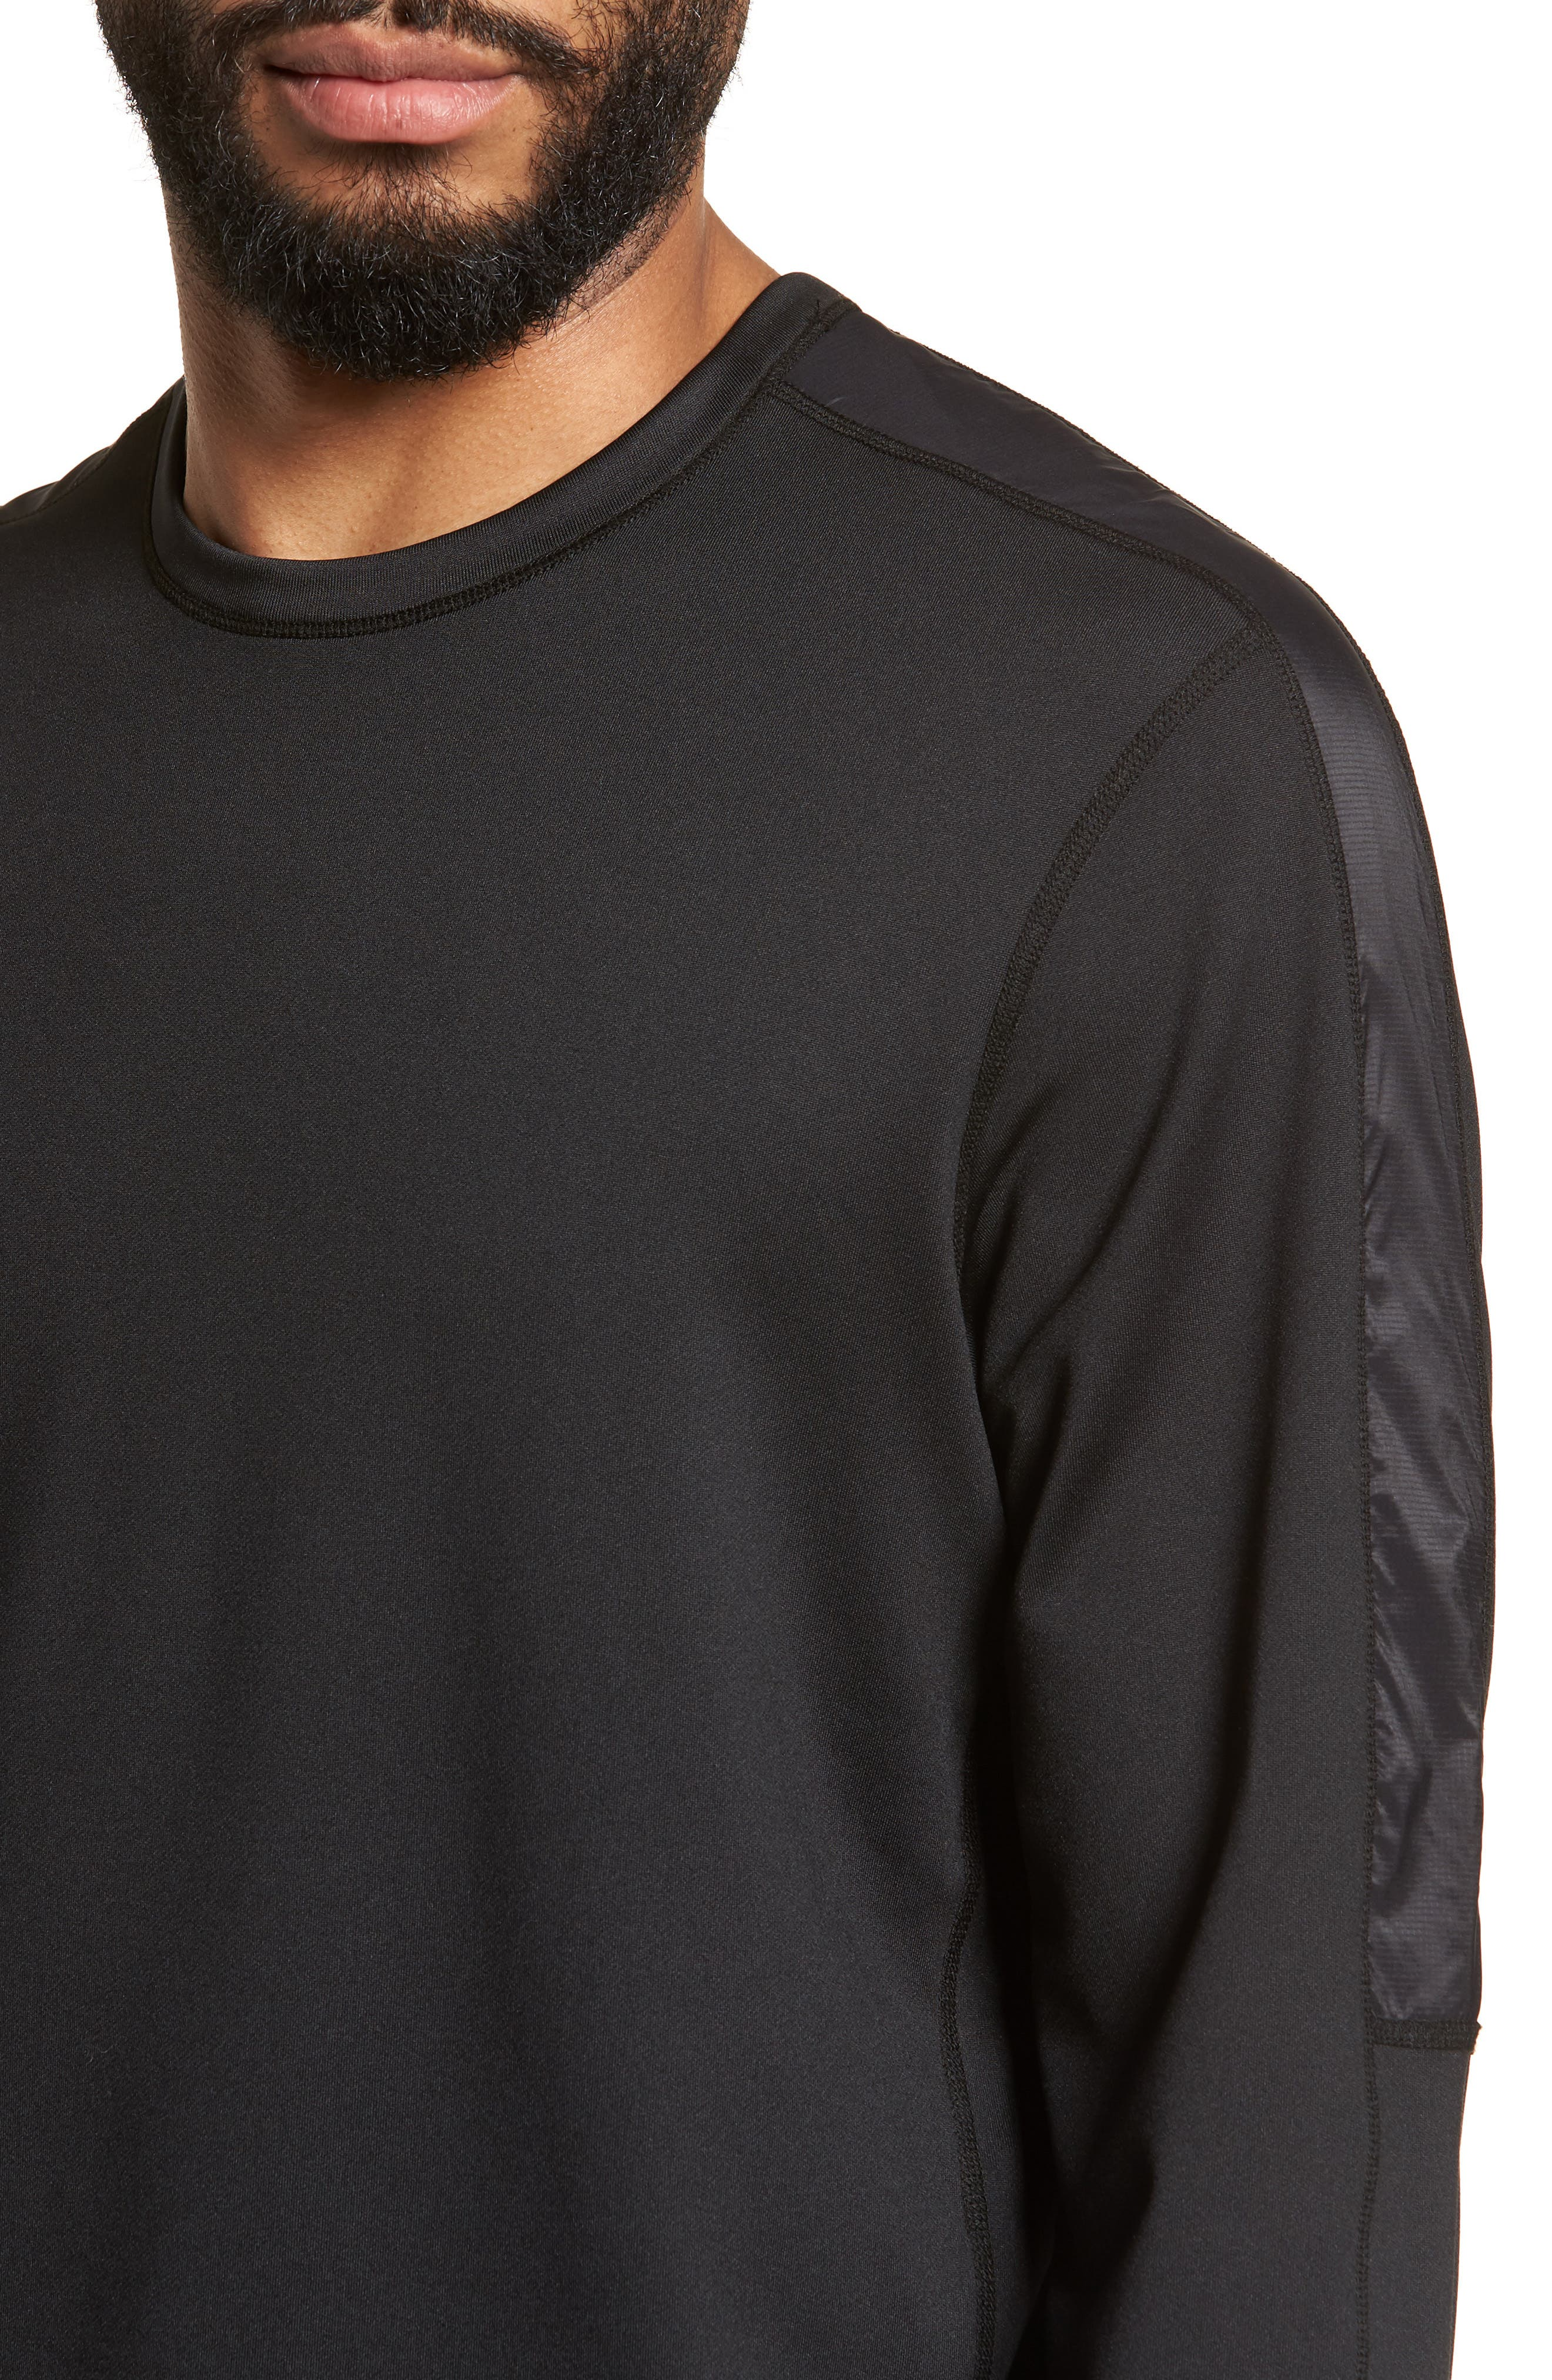 Hybrid Coolmax Crewneck Shirt,                             Alternate thumbnail 4, color,                             Black